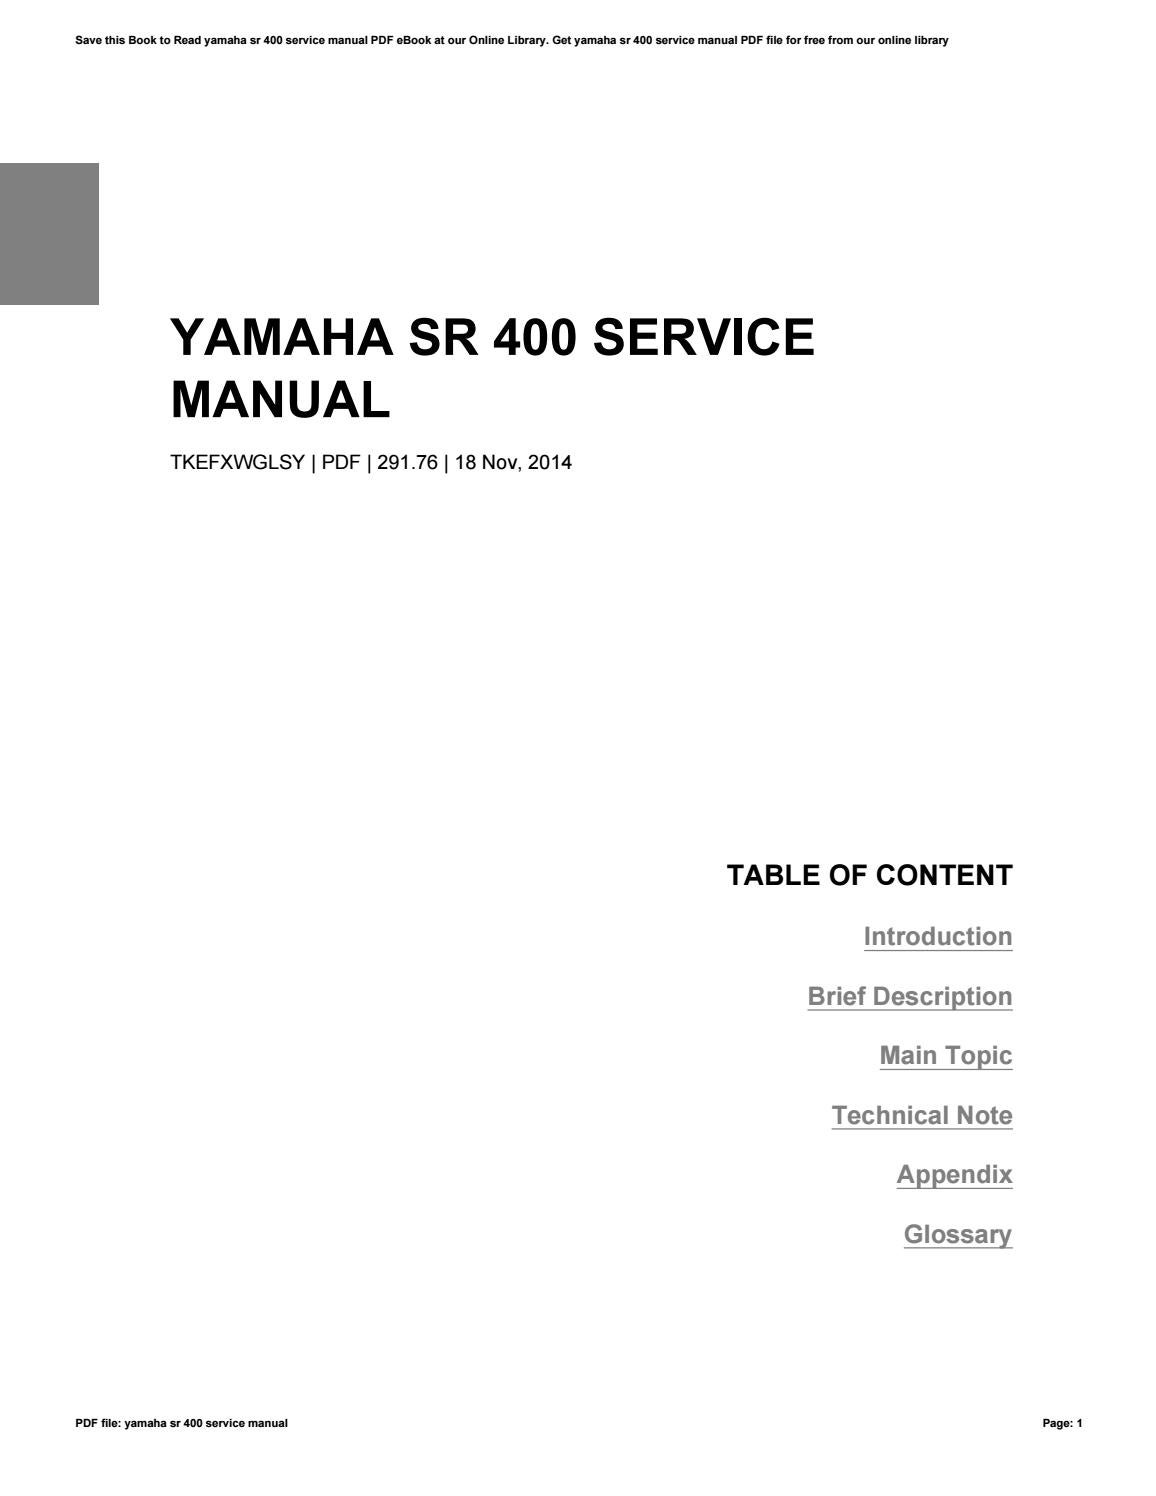 Toyota Tacoma 2015-2018 Service Manual: Lost Communication with ECM PCM A (U0100,U0125,U0126,U0129)